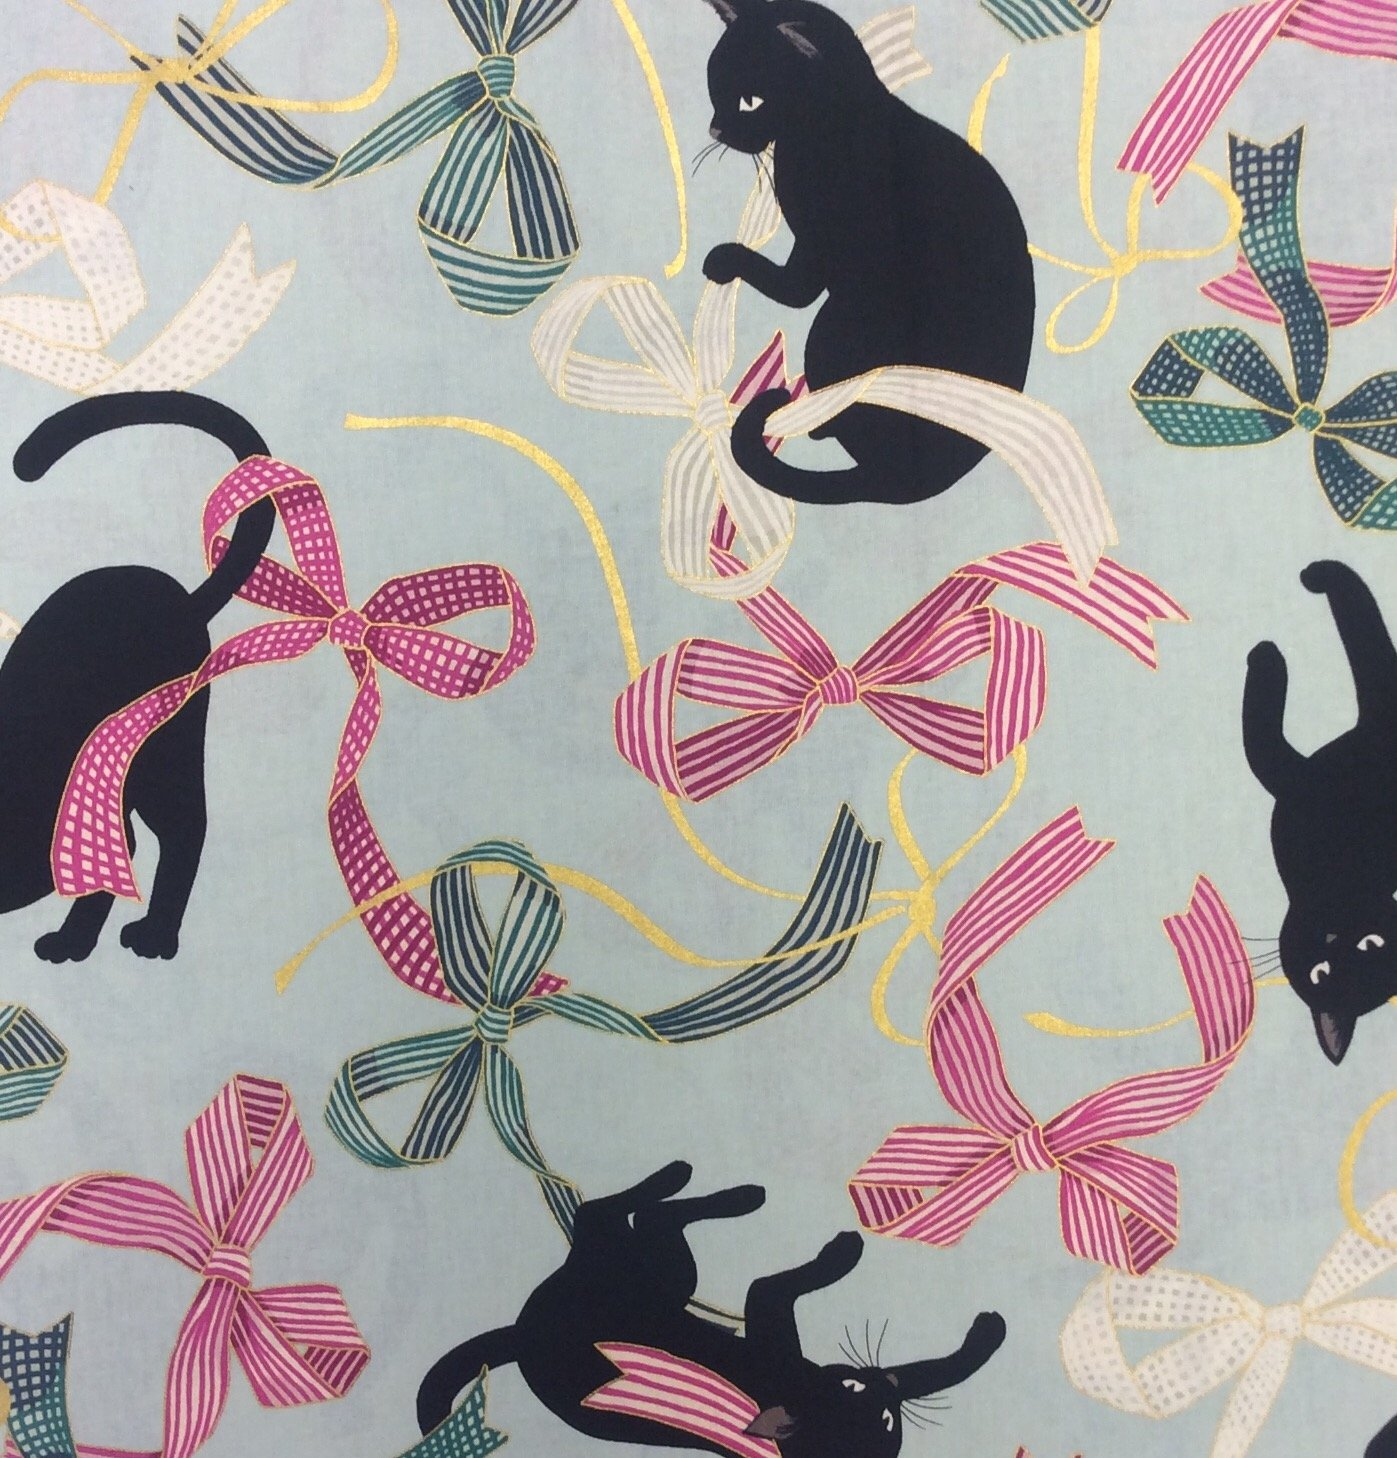 Neko Kitty Cat Japanese Asian Retro Kitten & Bows Cotton Quilt Fabric NT80